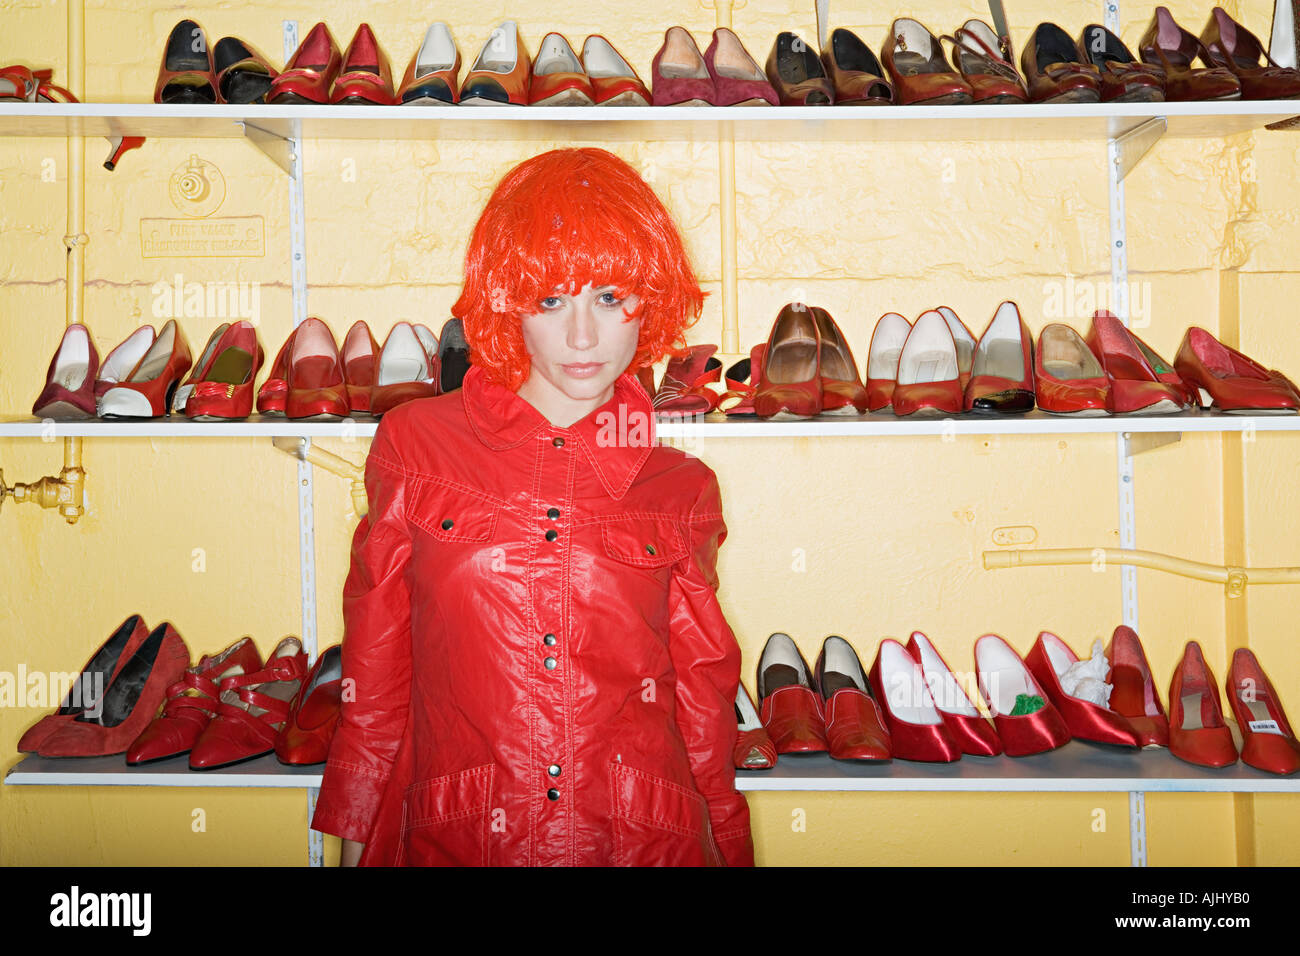 Frau trägt eine rote Perücke Stockbild